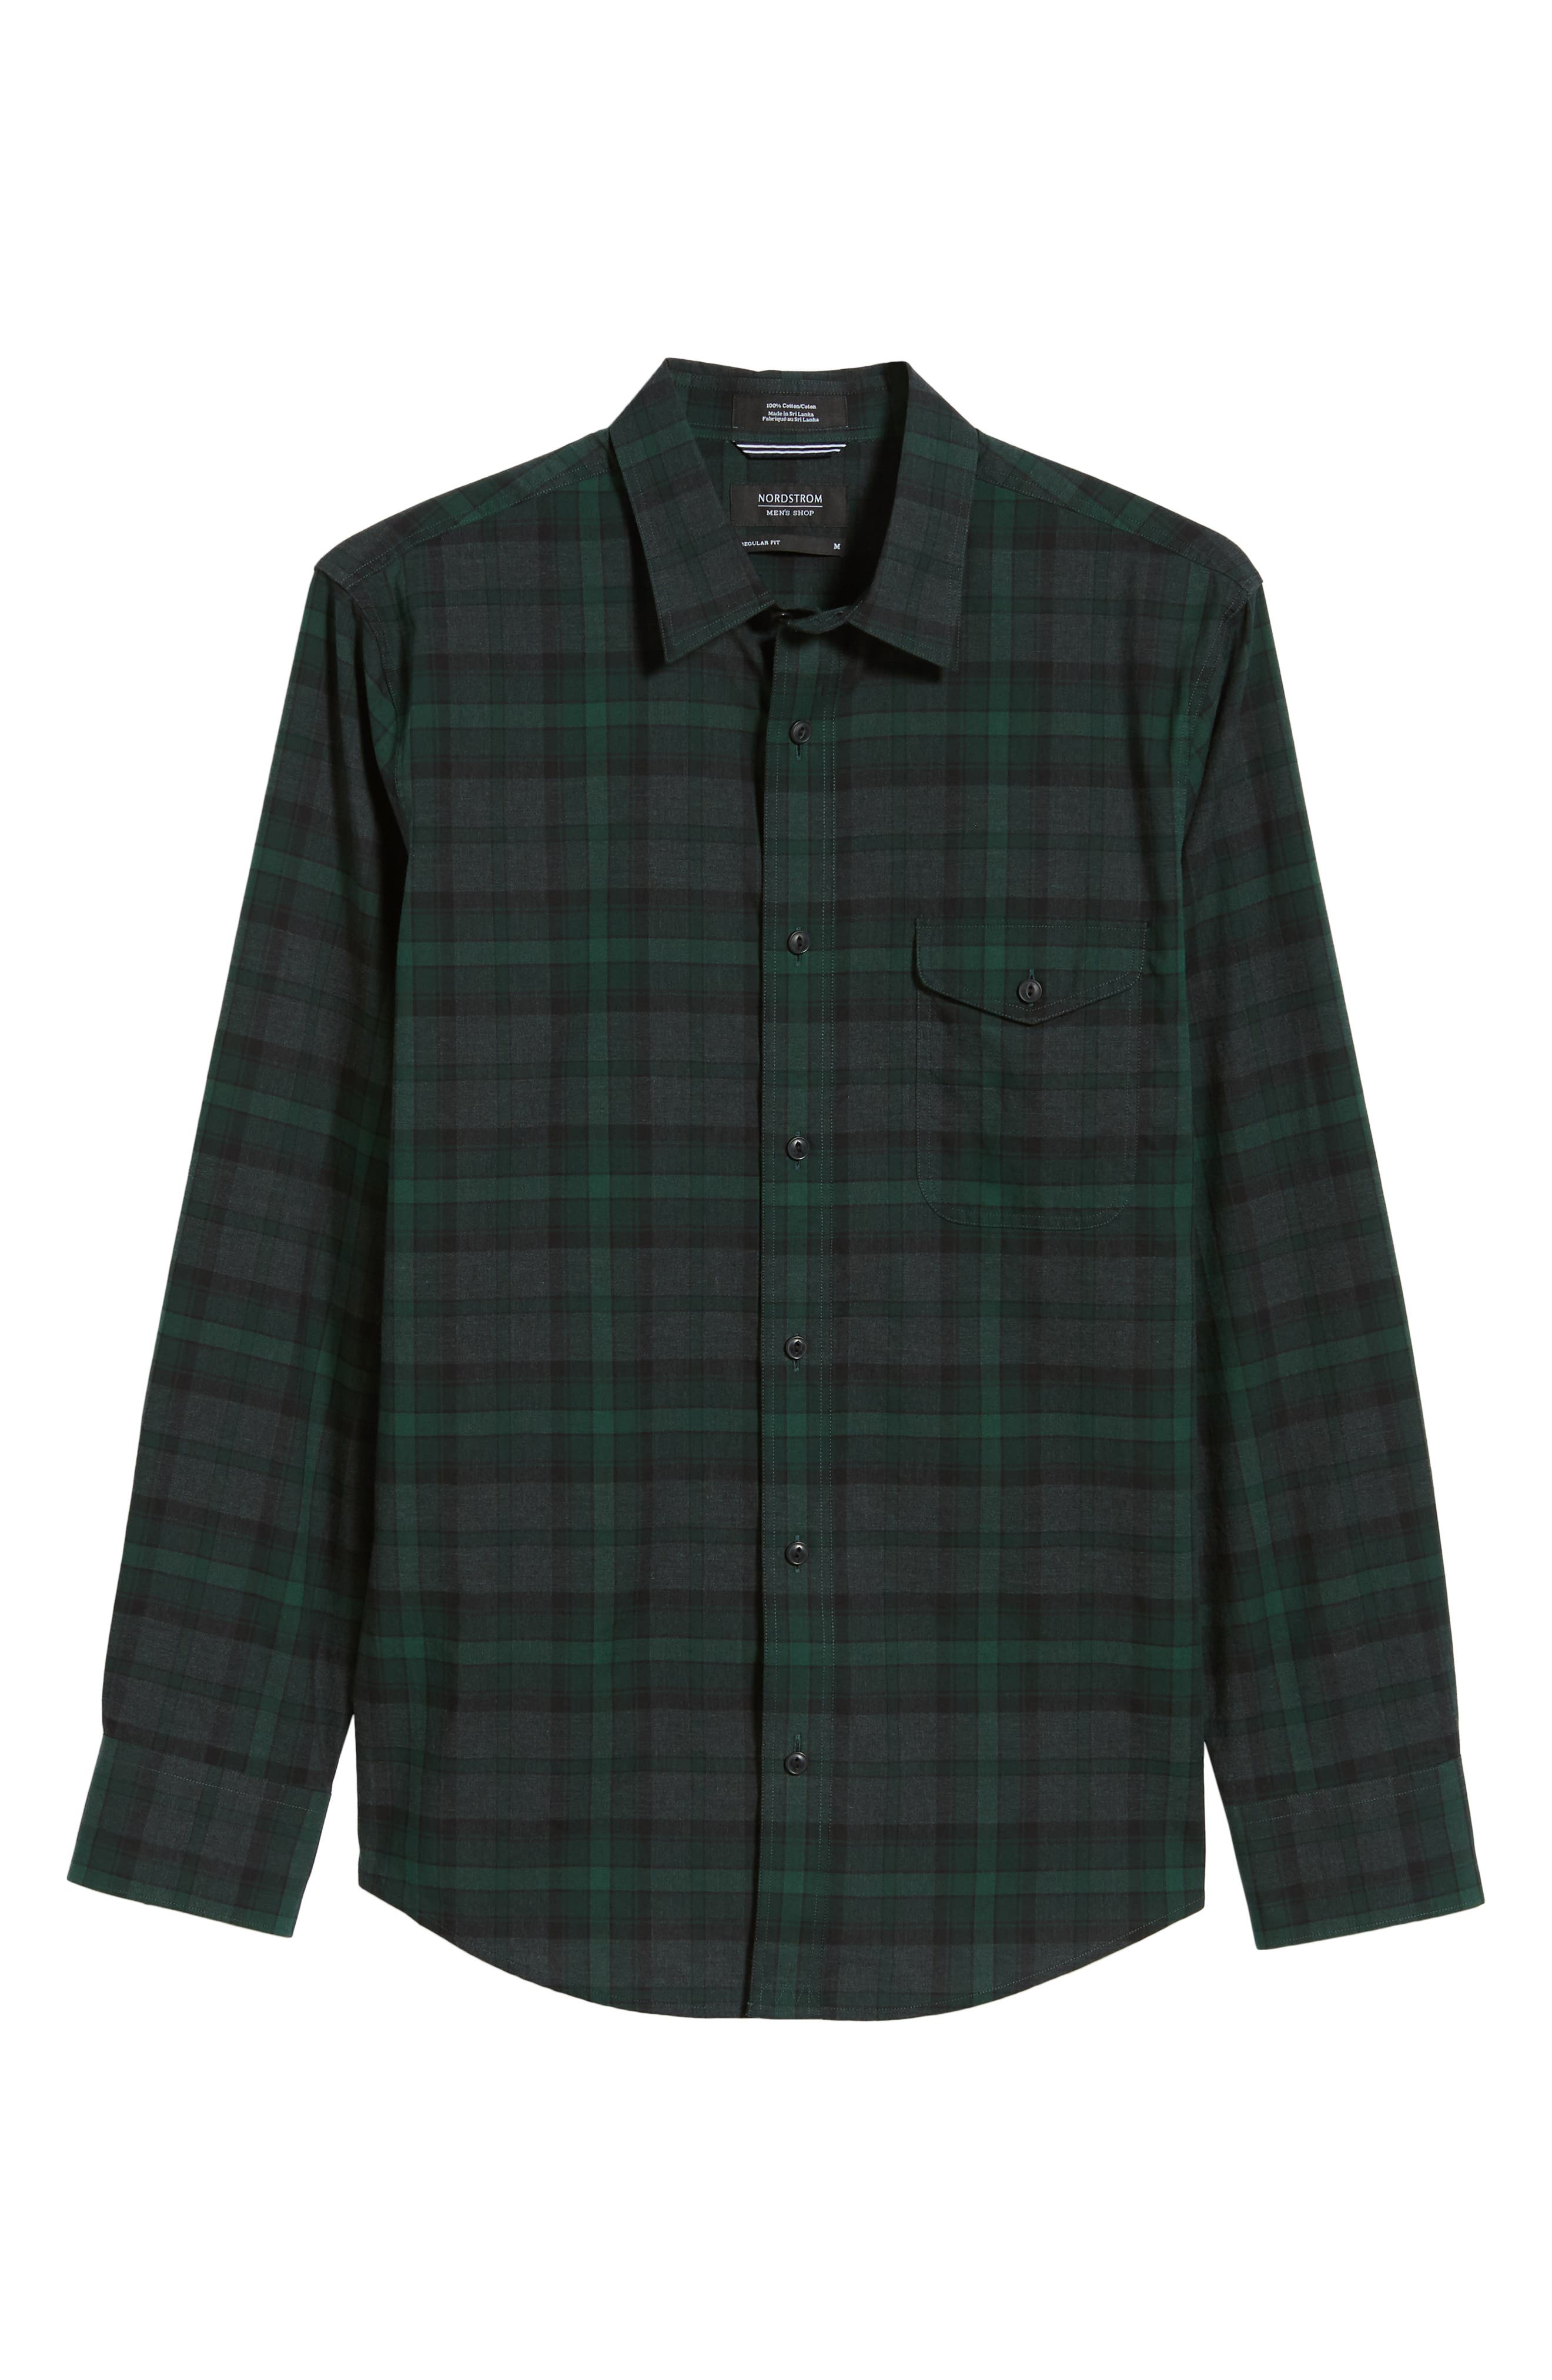 Regular Fit Plaid Flannel Sport Shirt,                             Alternate thumbnail 6, color,                             GREEN FOREST GREY PLAID